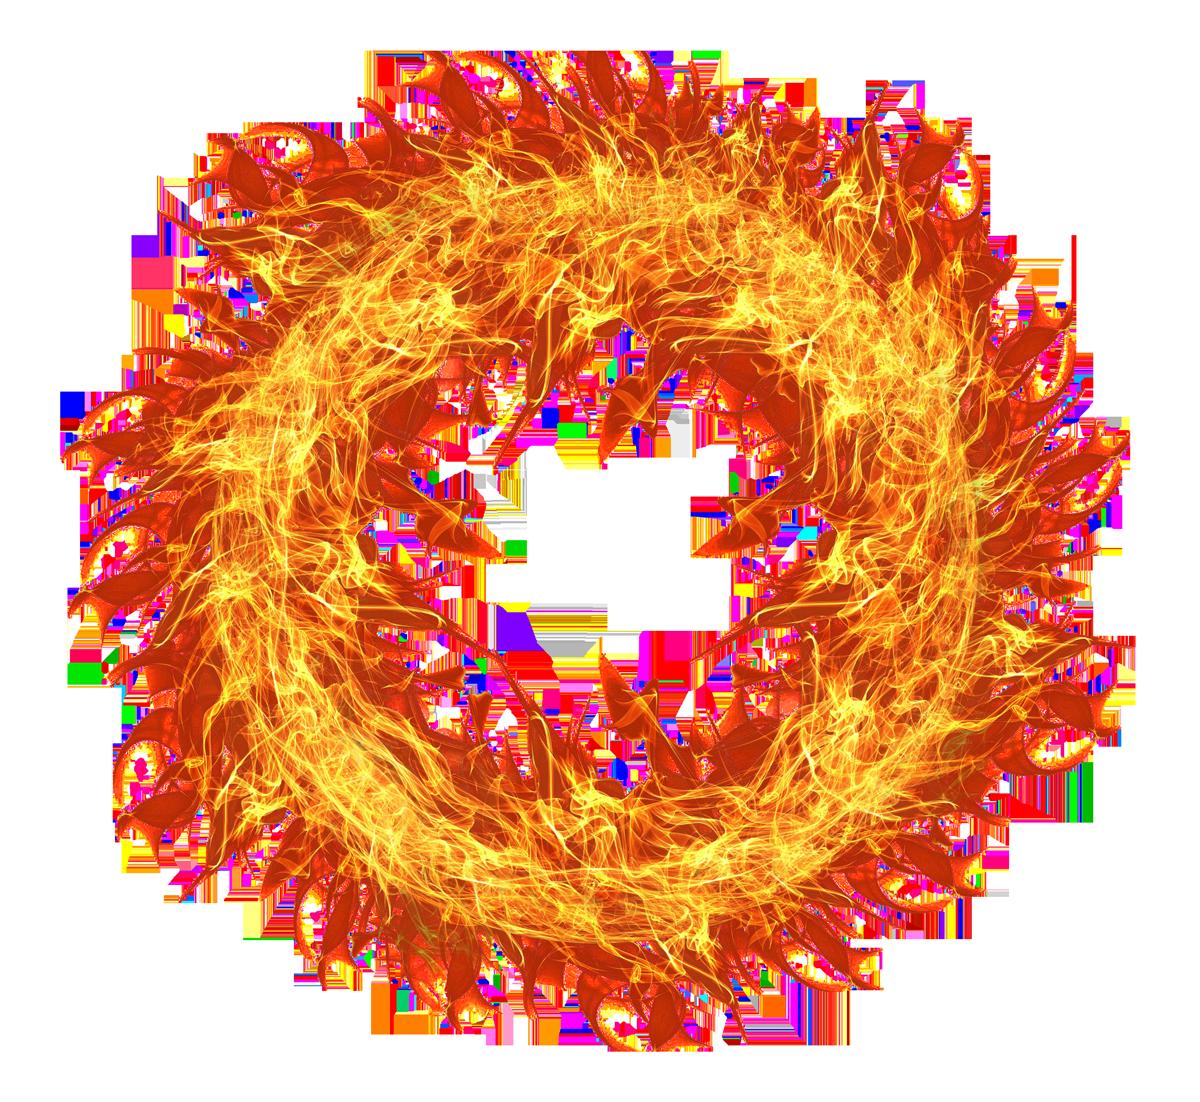 Fire Flame Circle Transparent PNG Image.